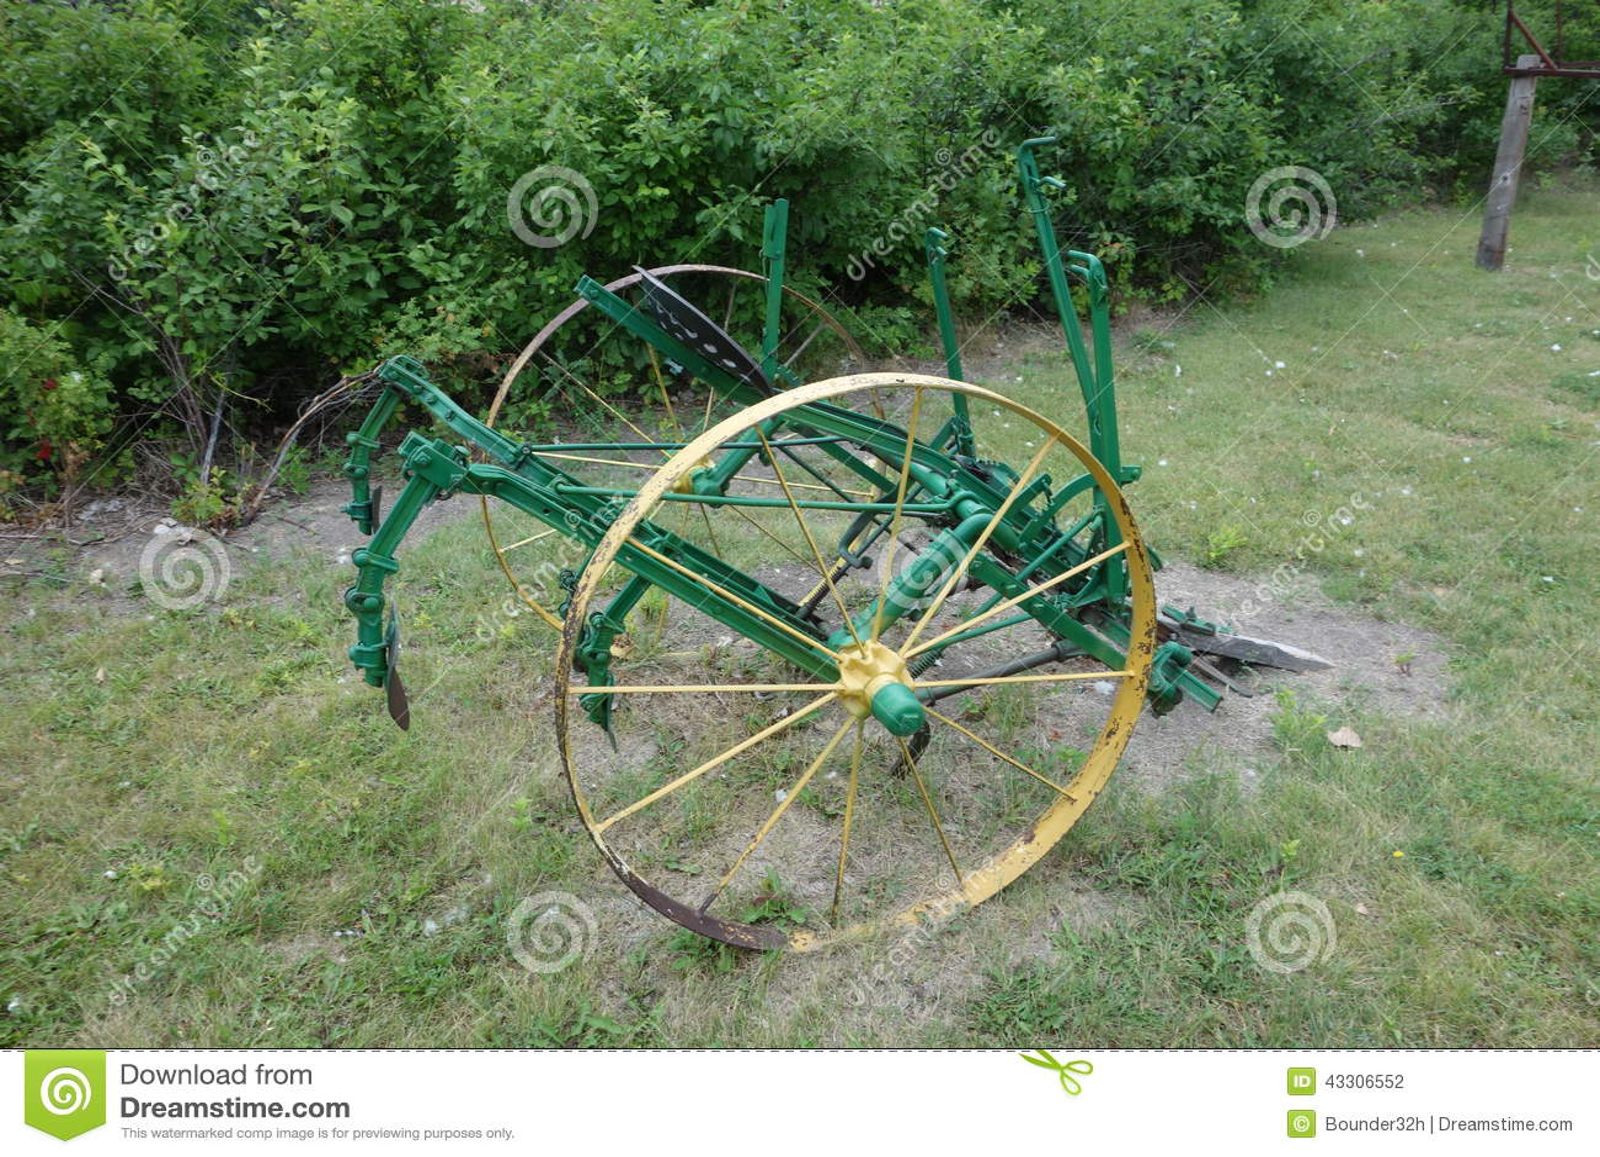 Old Fashioned Farm Eqipment